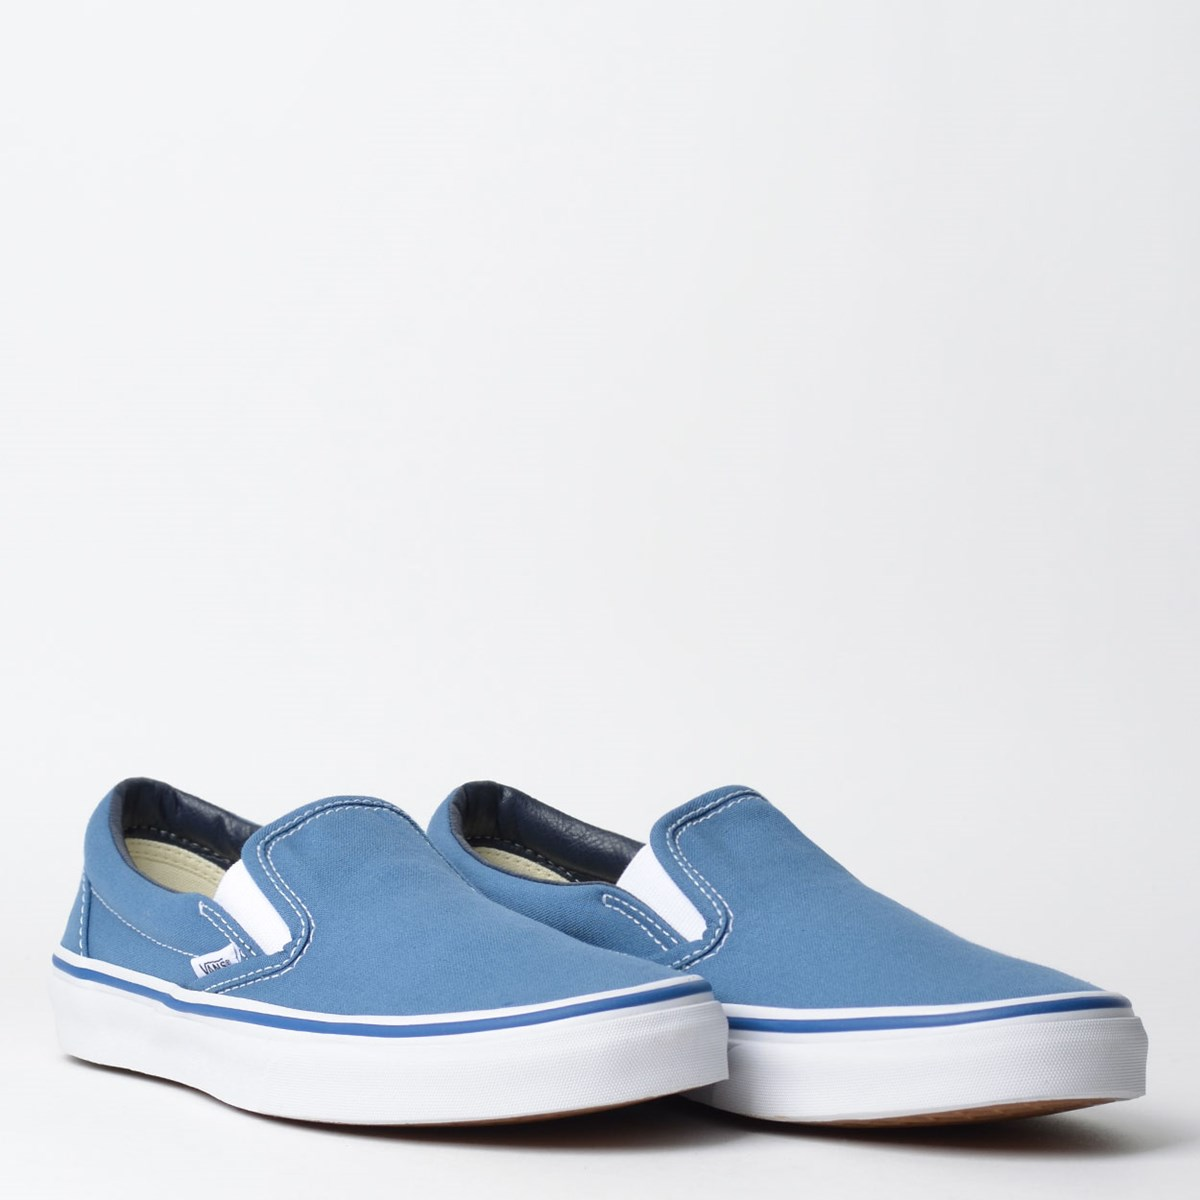 Tênis Vans Classic Slip On Navy VN000EYENVY